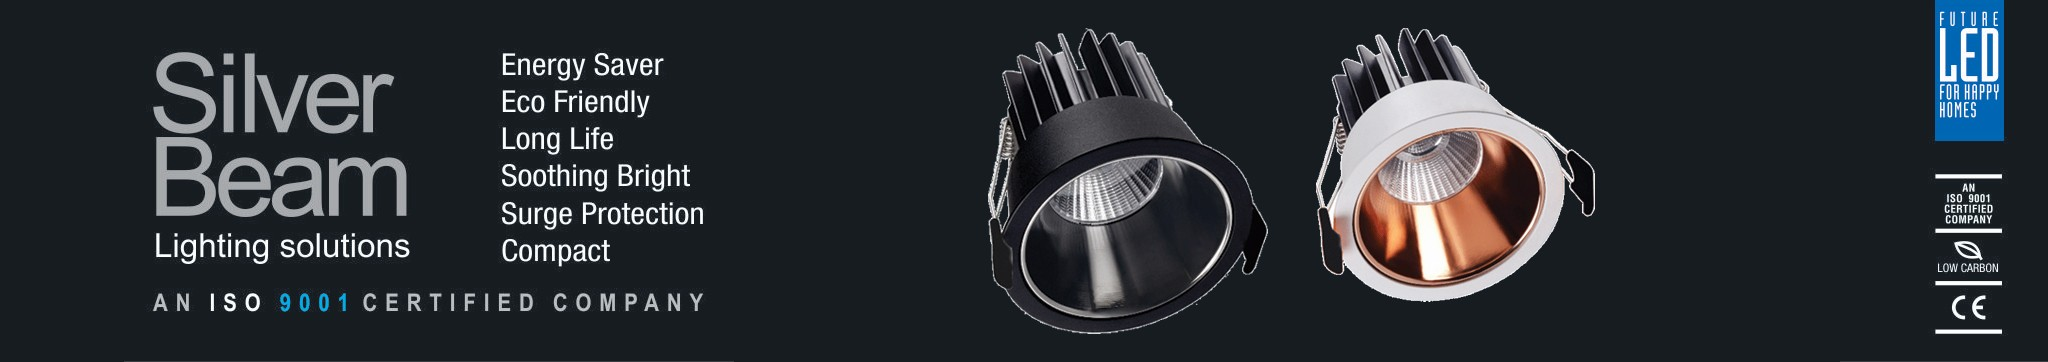 Led-Down-Lit-Cob-Light-New